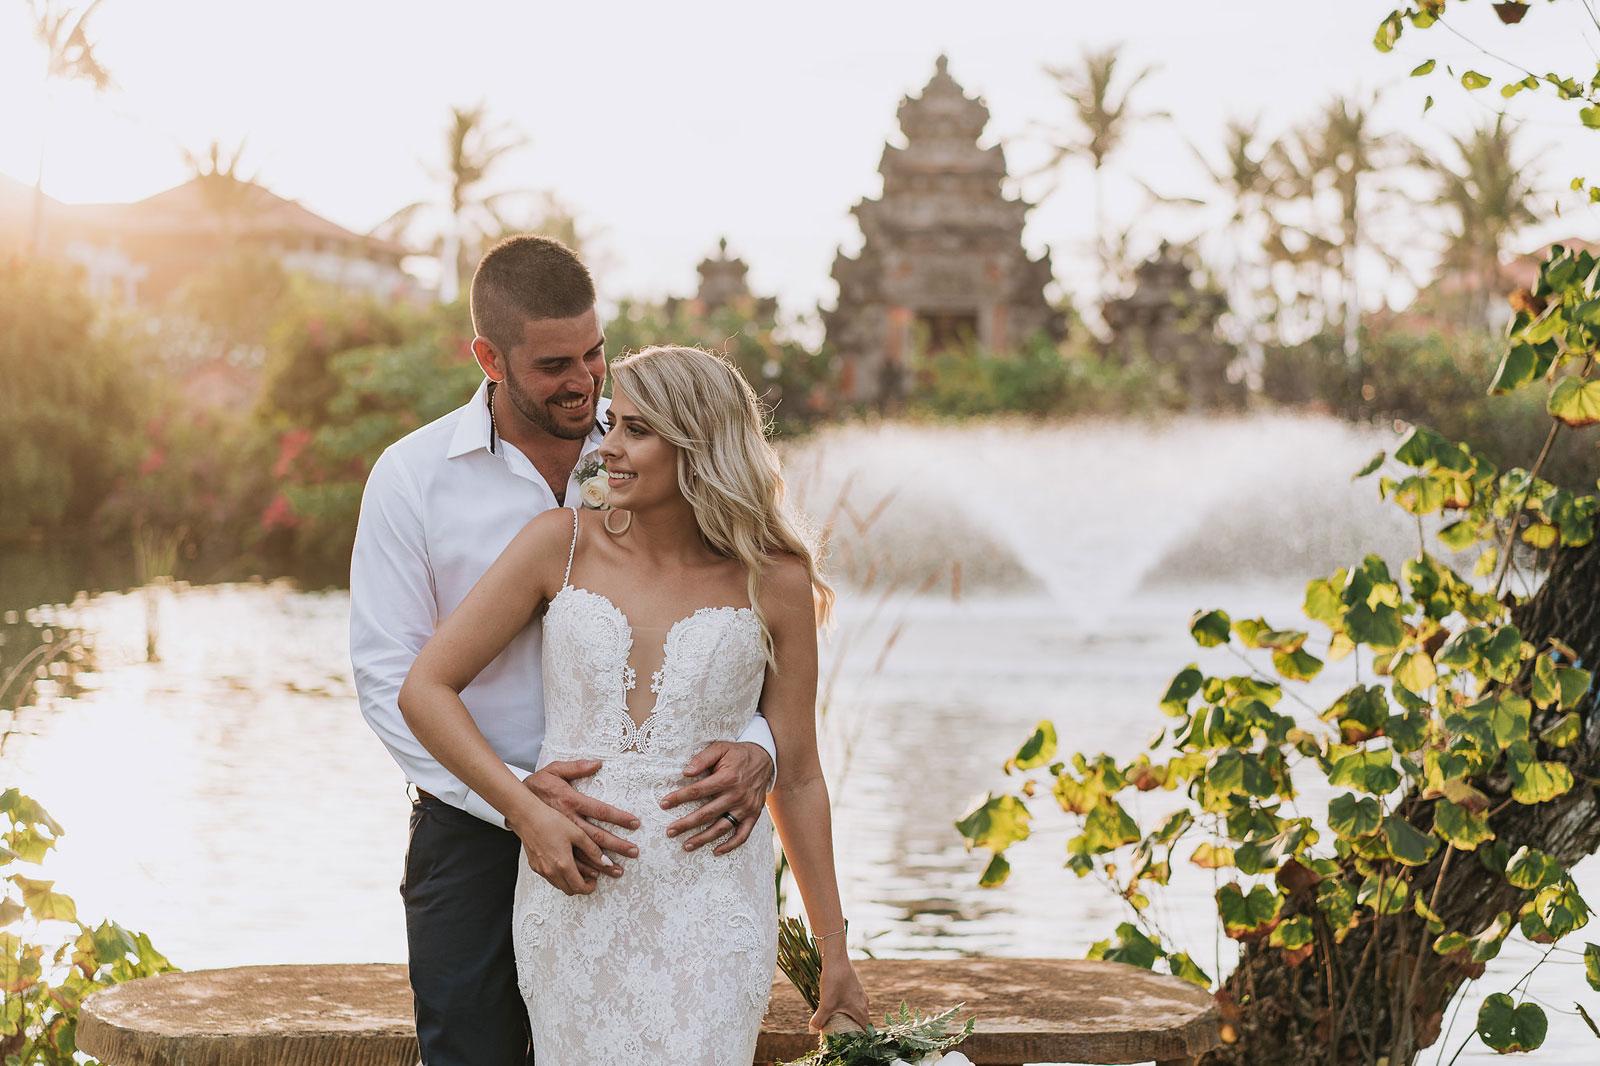 newfound-j-j-bali-nusa-dua-wedding-wedding-photographer-061-a